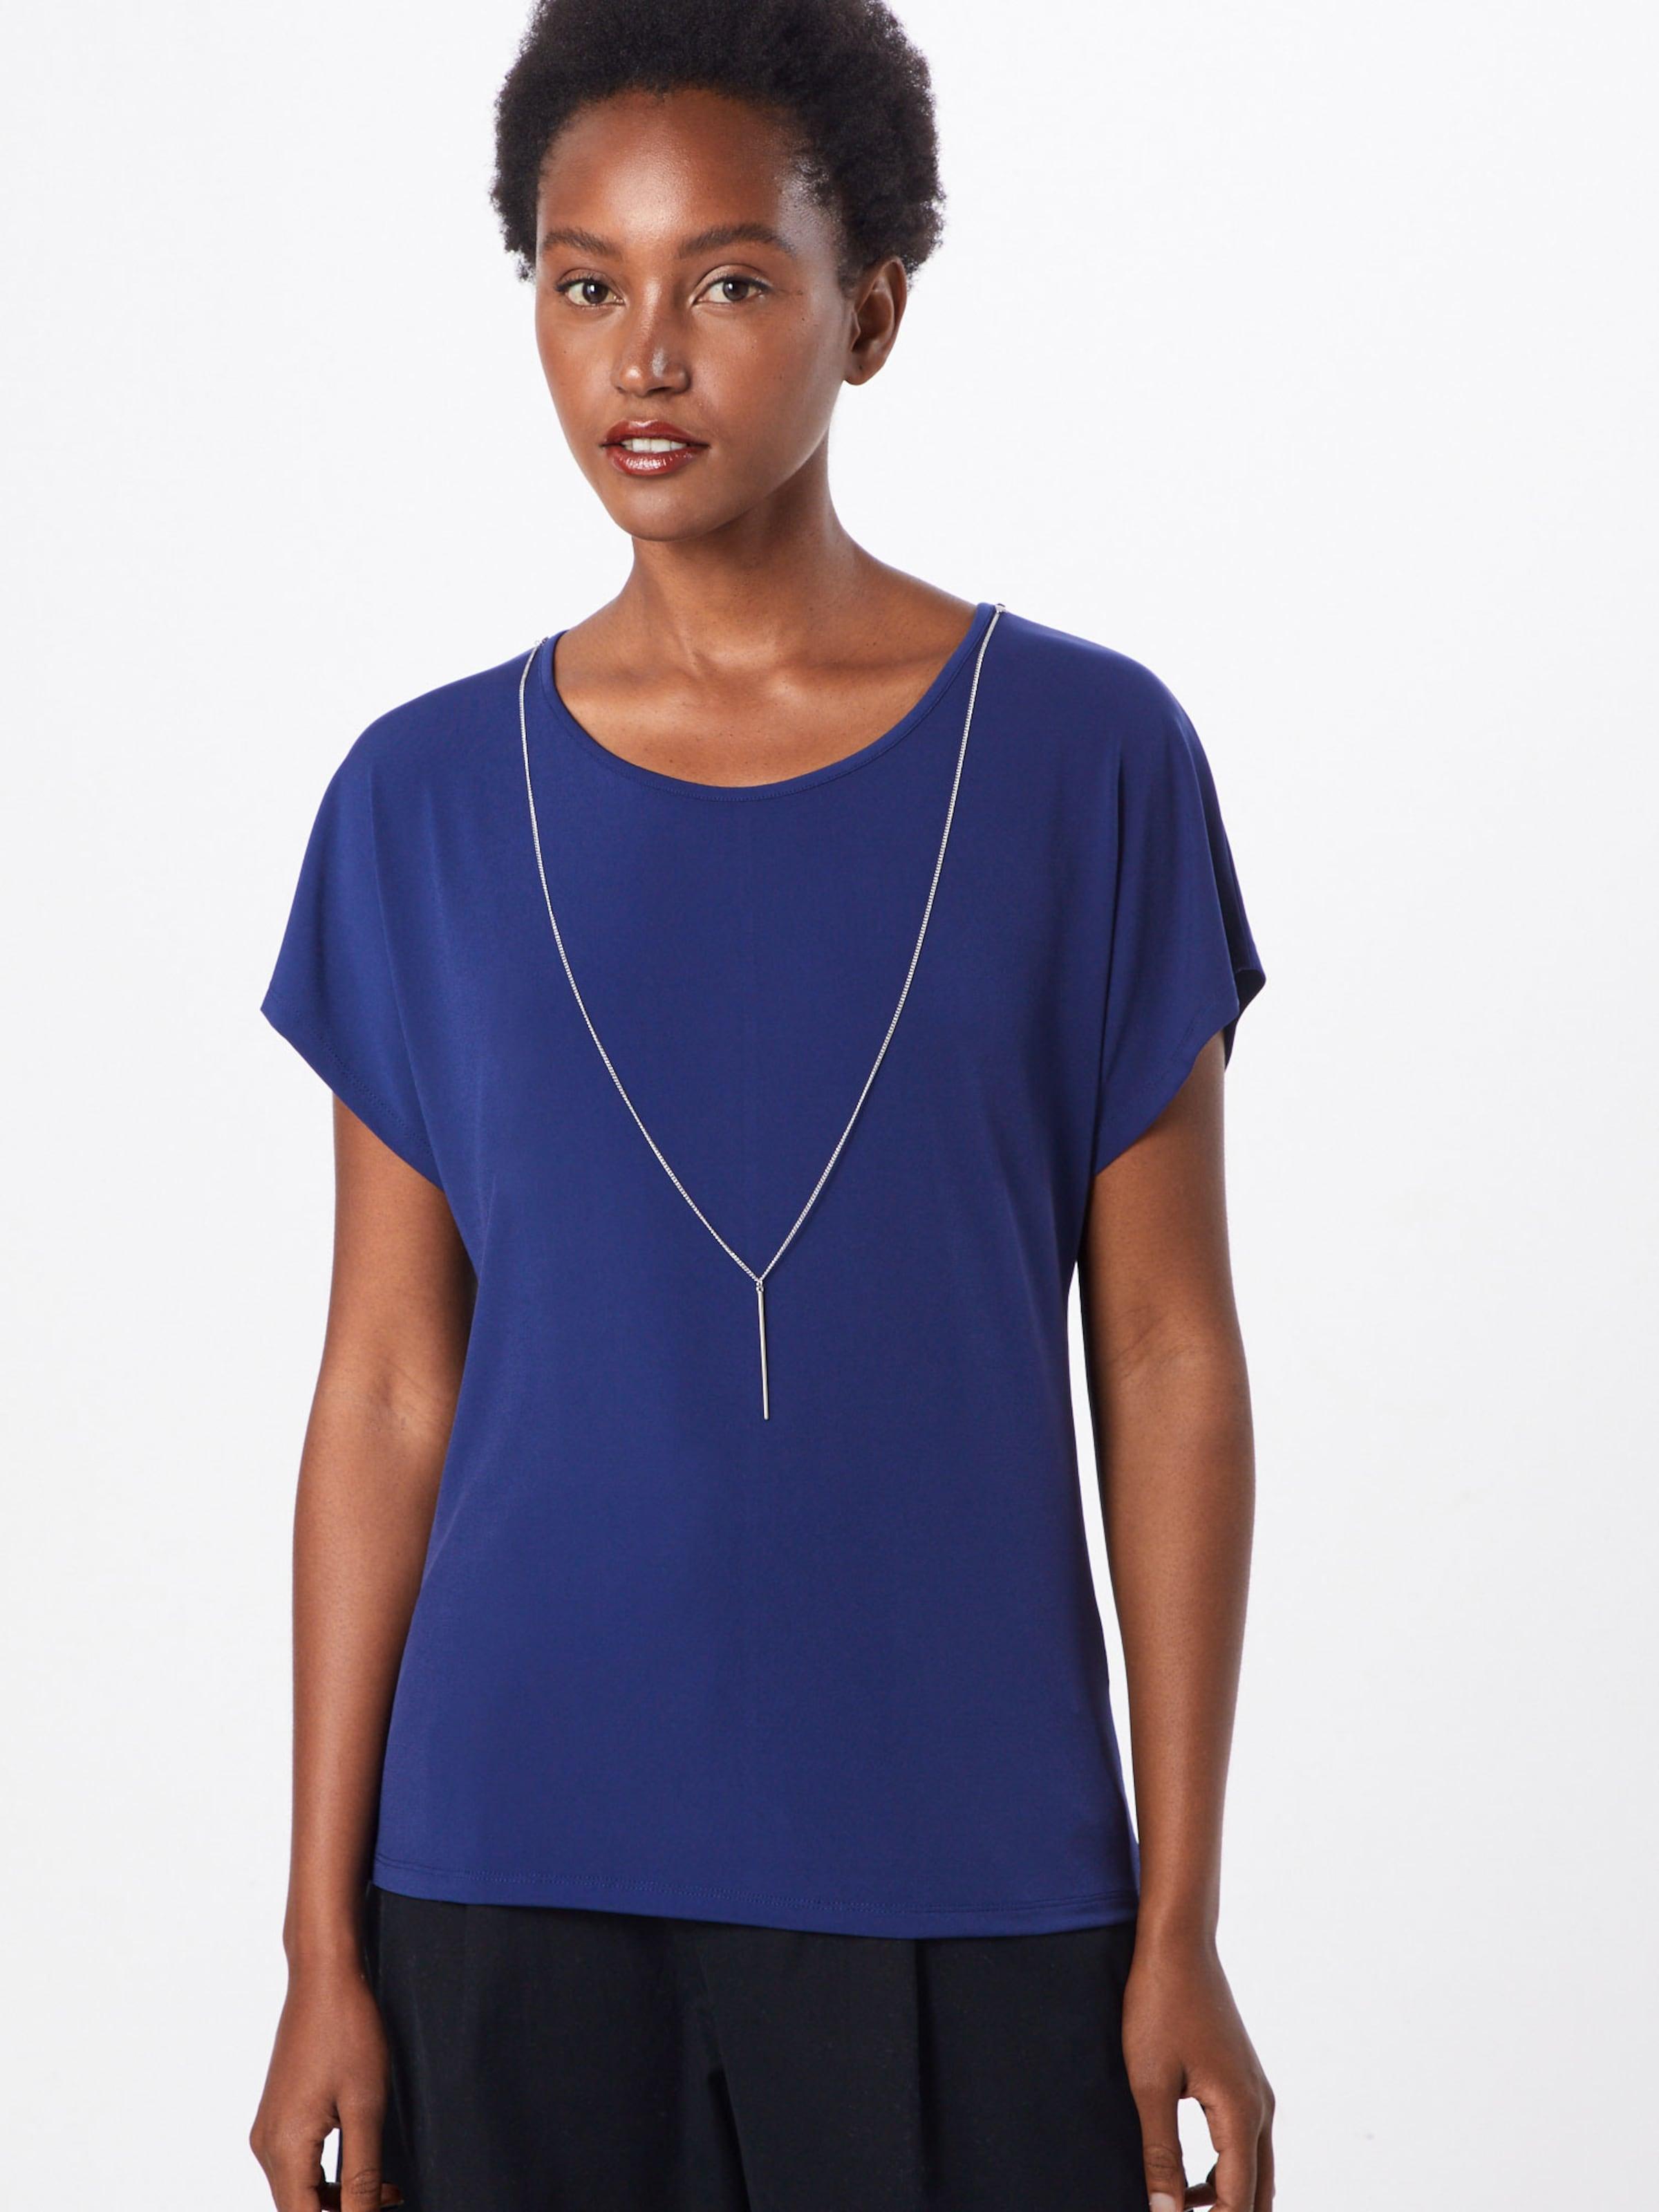 You 'mandy' Marine shirt En Bleu T About wPkOZilXTu